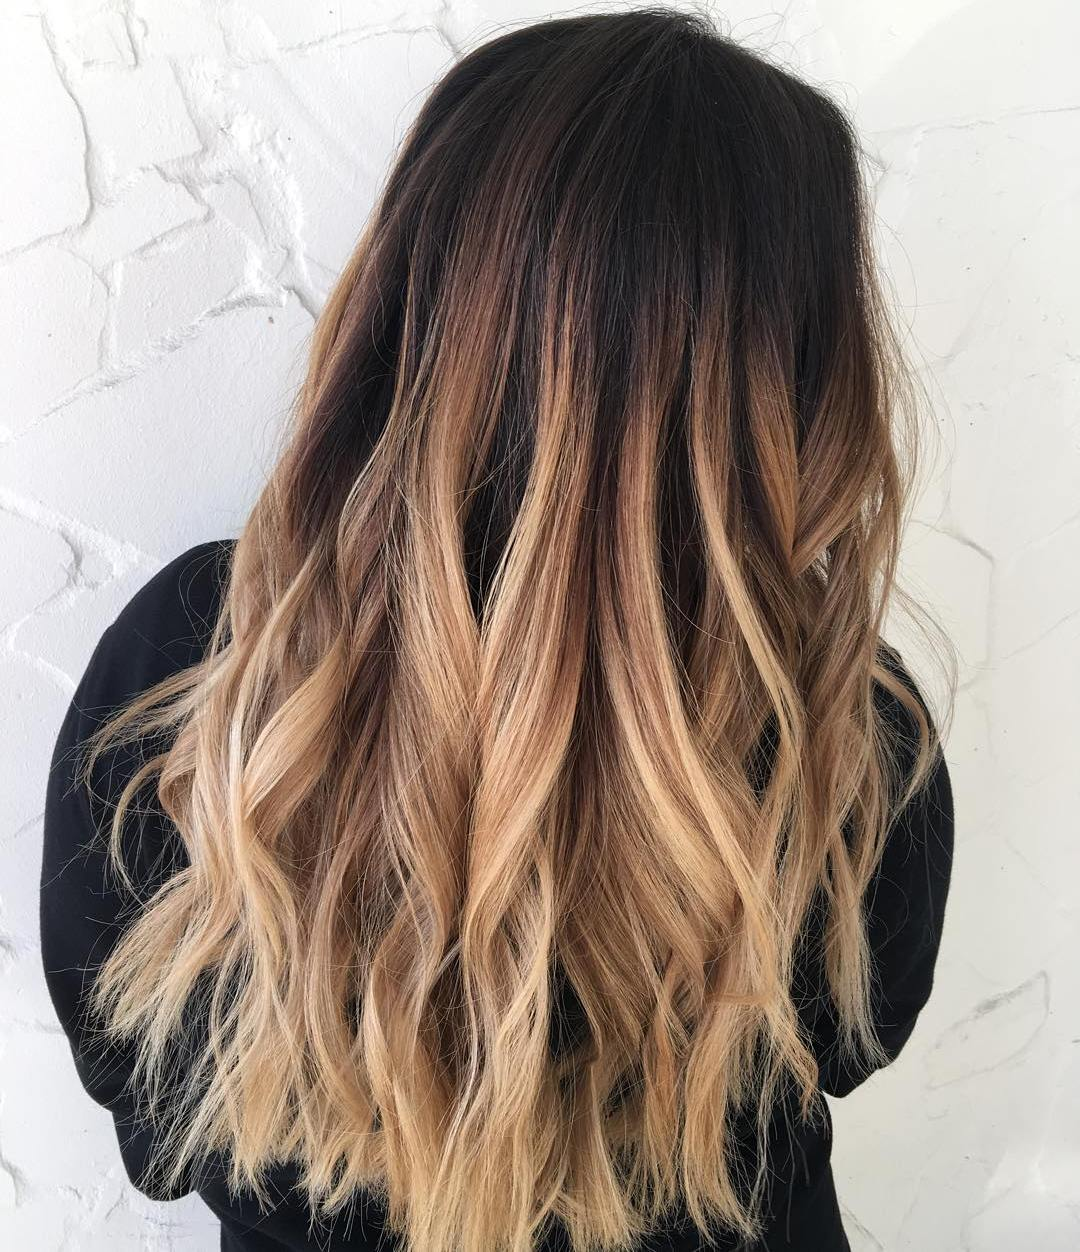 Many Dark ombre hair color urbanization